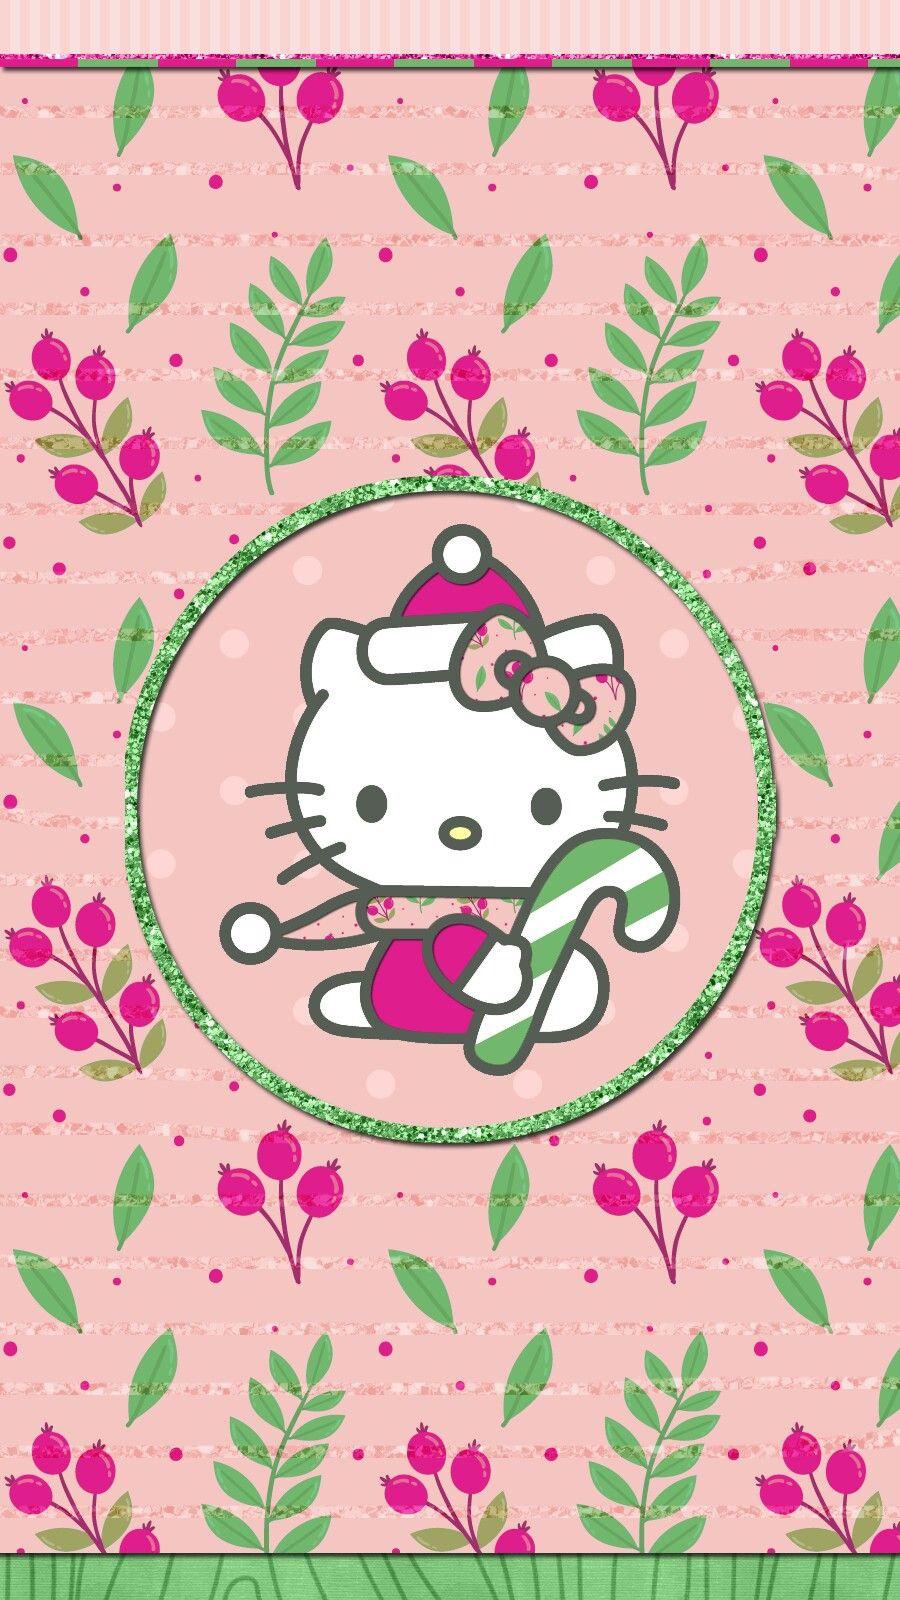 Merry Christmas Wallpaper Iphone Happy Holiday Hello Kitty Hello Kitty Wallpaper Hello Kitty Backgrounds Hello Kitty Christmas